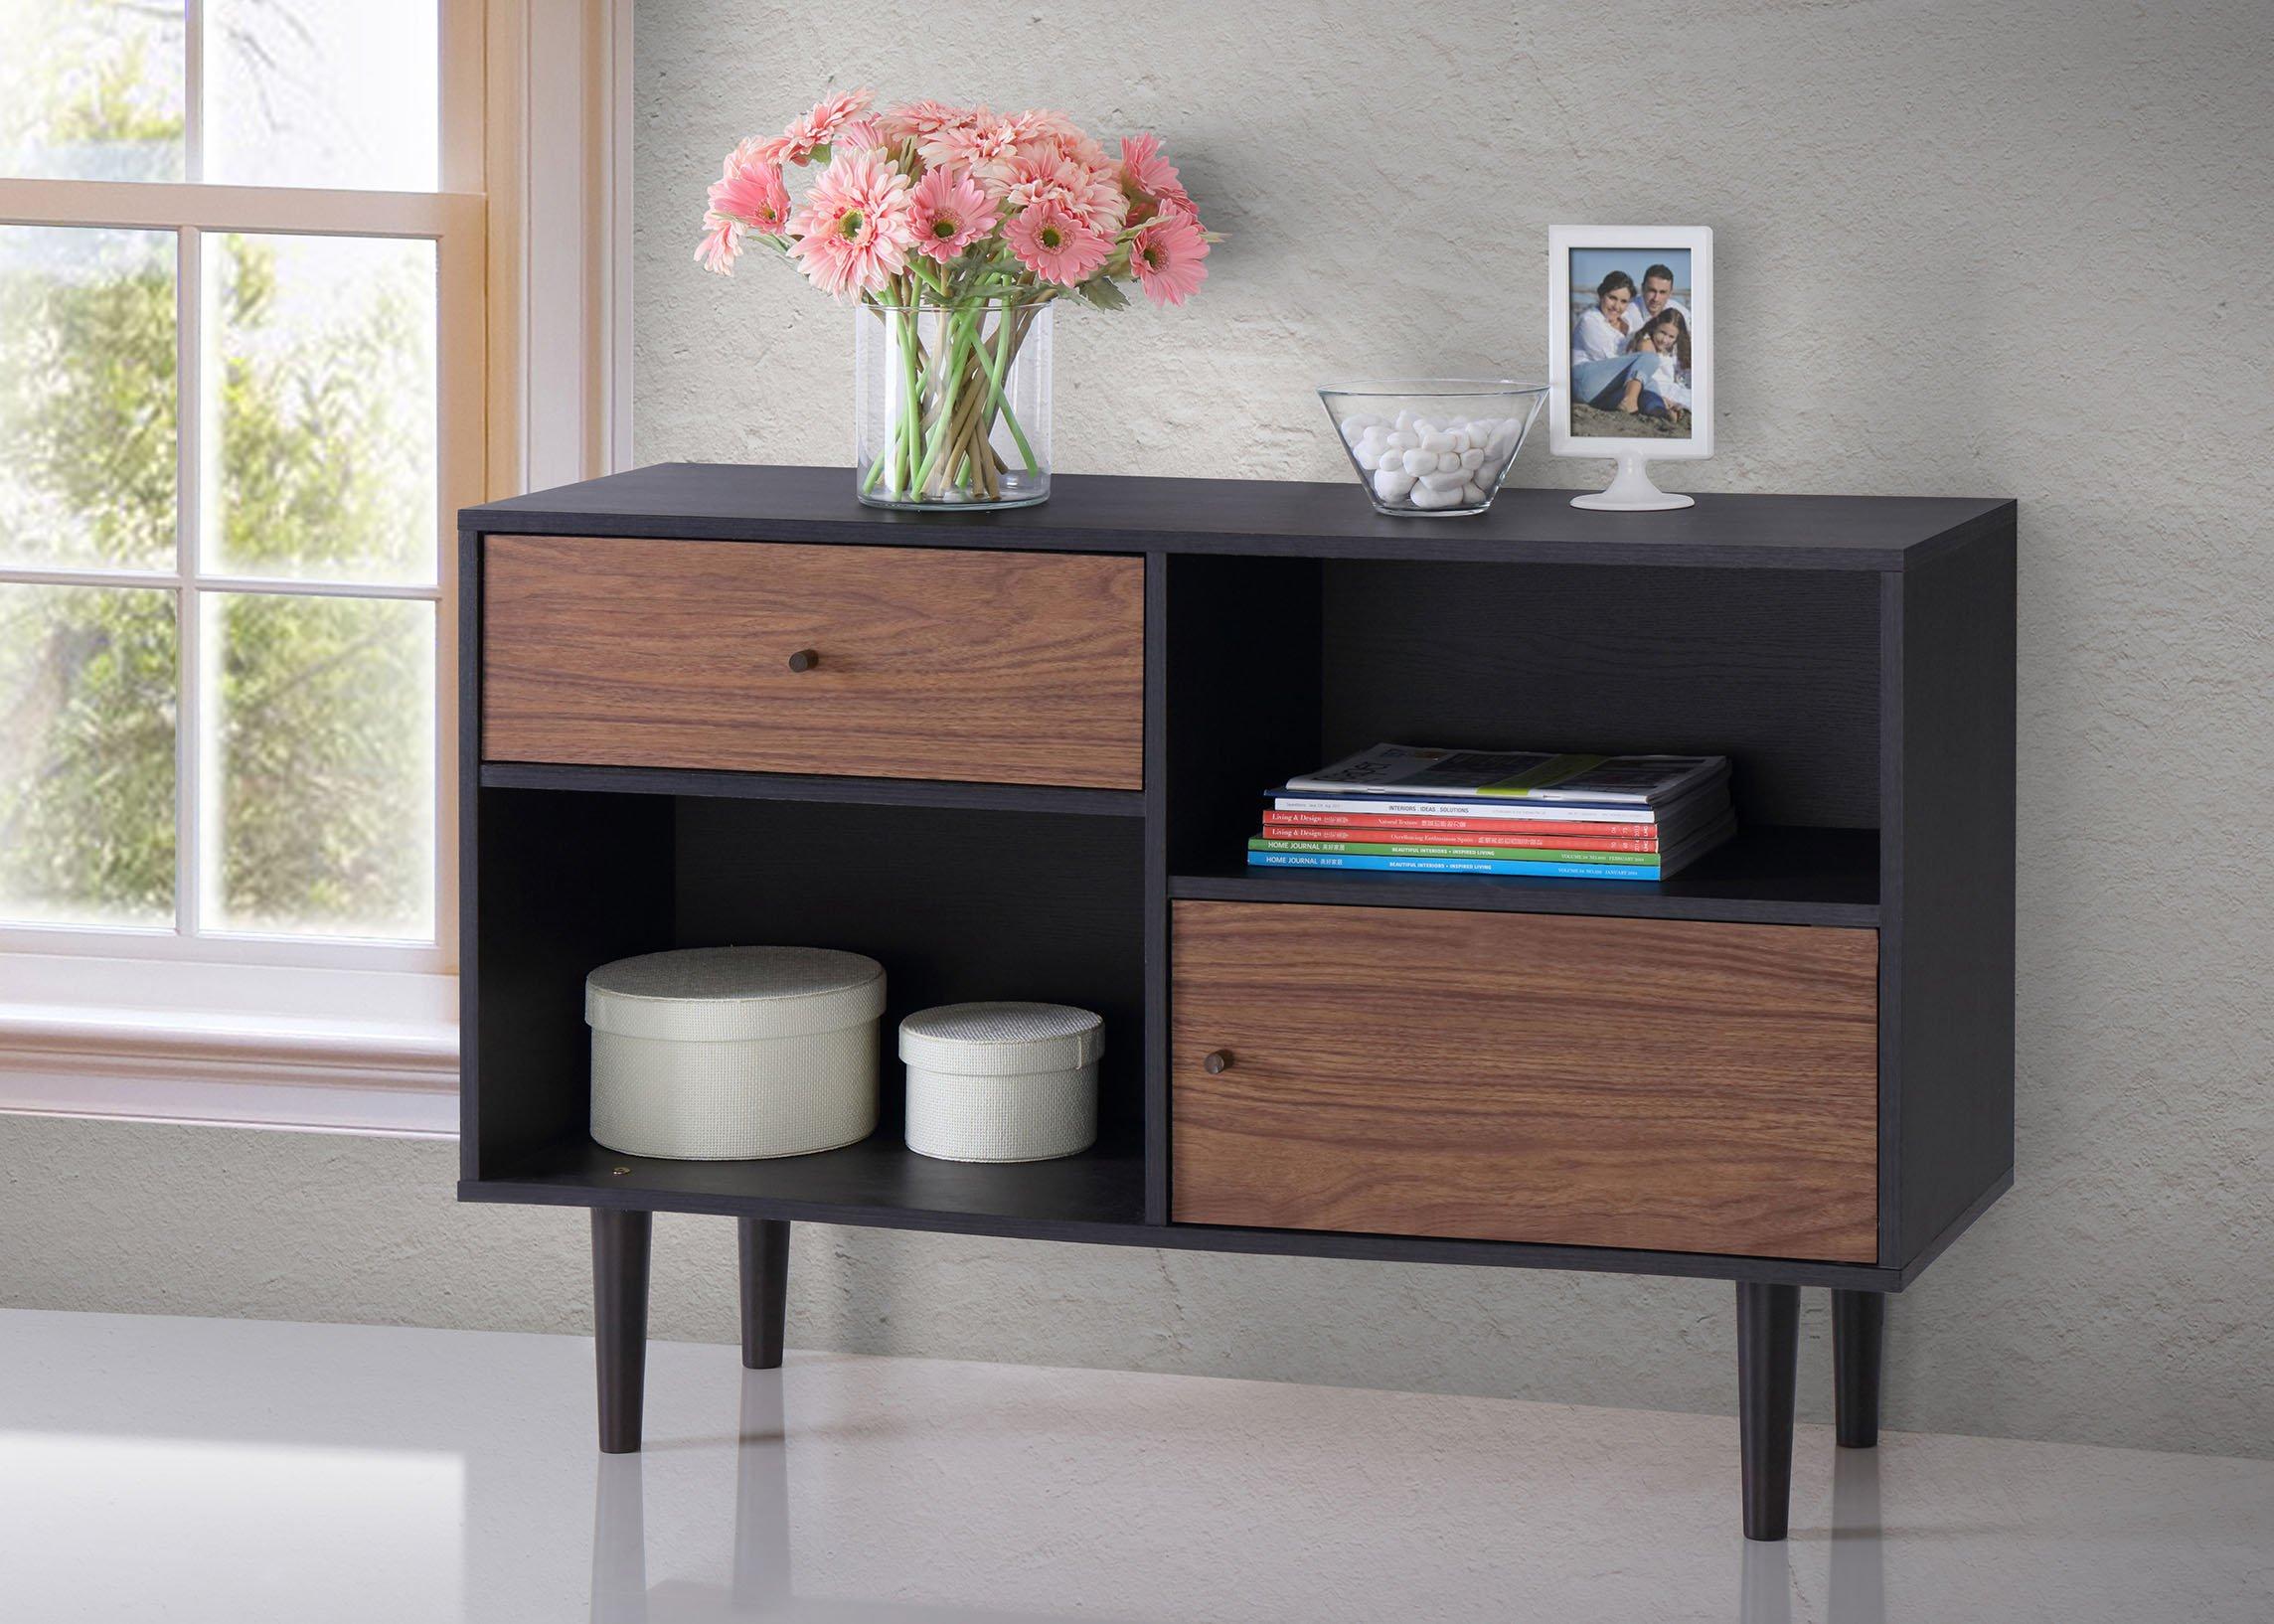 Baxton Furniture Studios Auburn Mid-Century Modern Scandinavian Style Sideboard Storage Cabinet